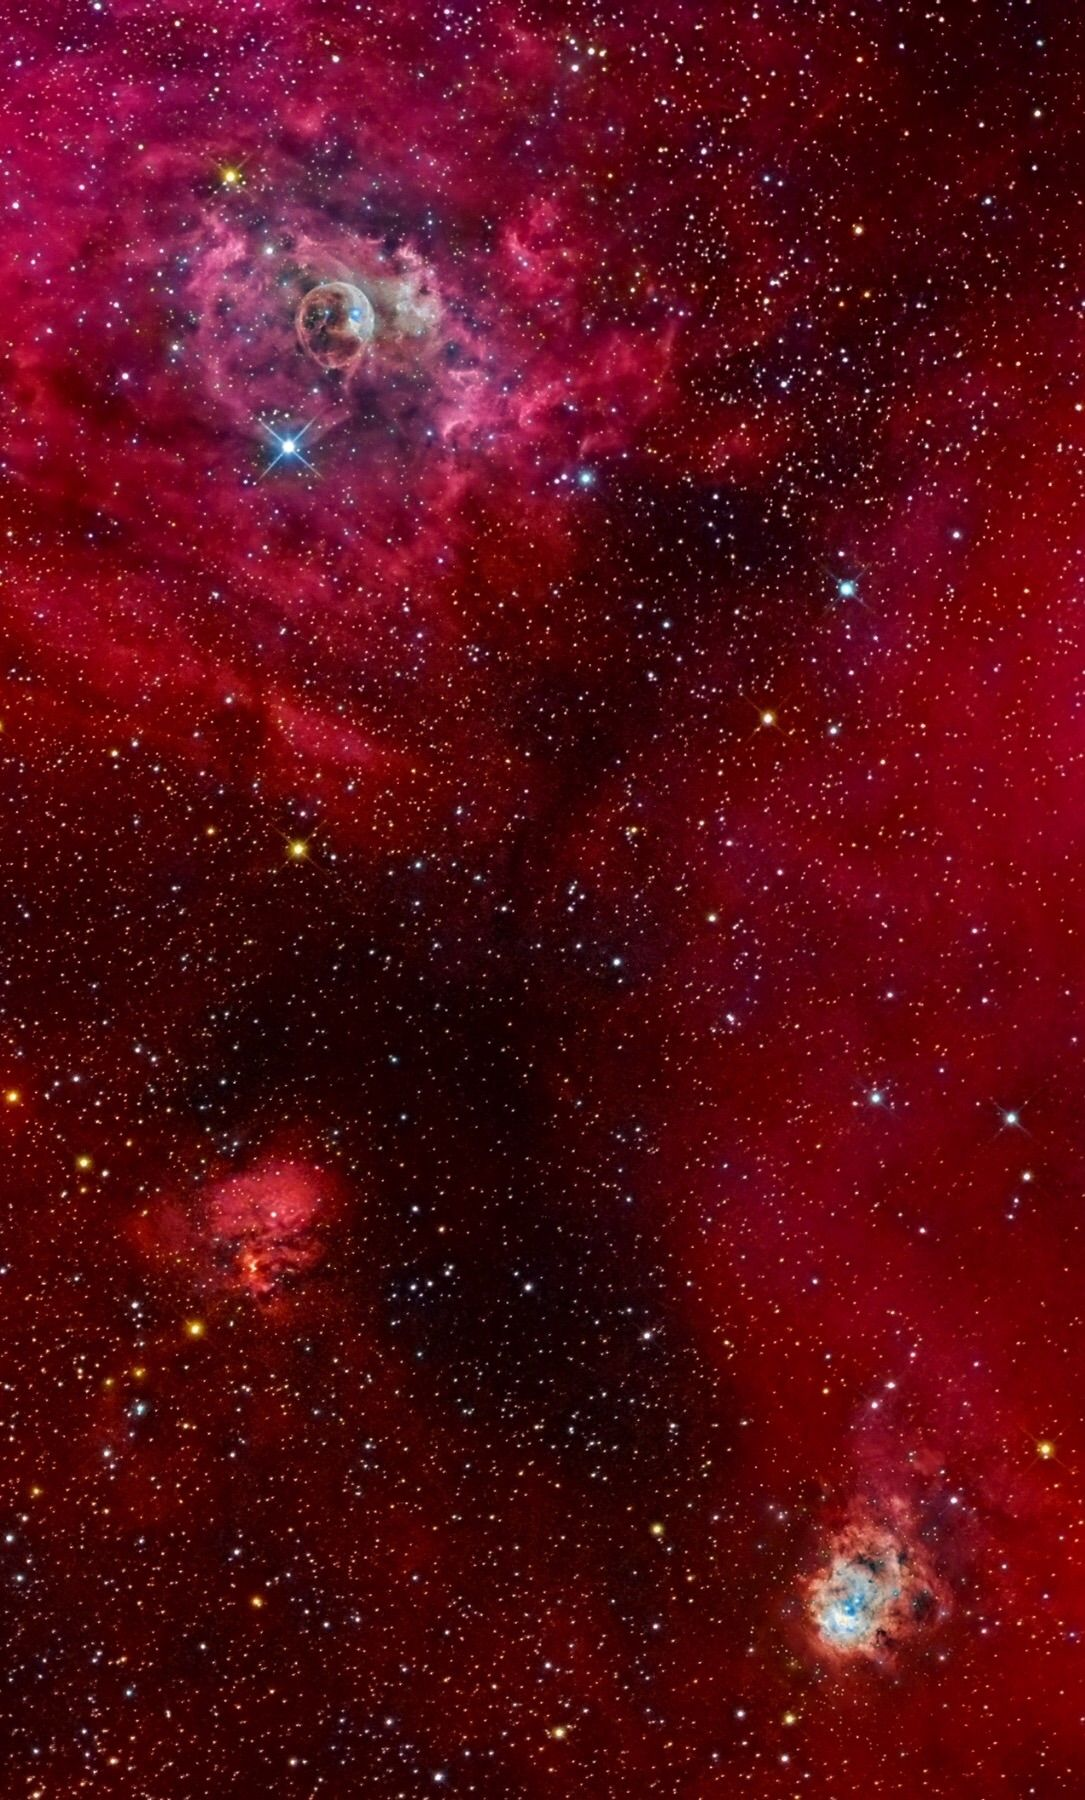 NGC 7635 (Bubble Nebula), Sh2-159, NGC 7538 Credit: Emil Ivanov